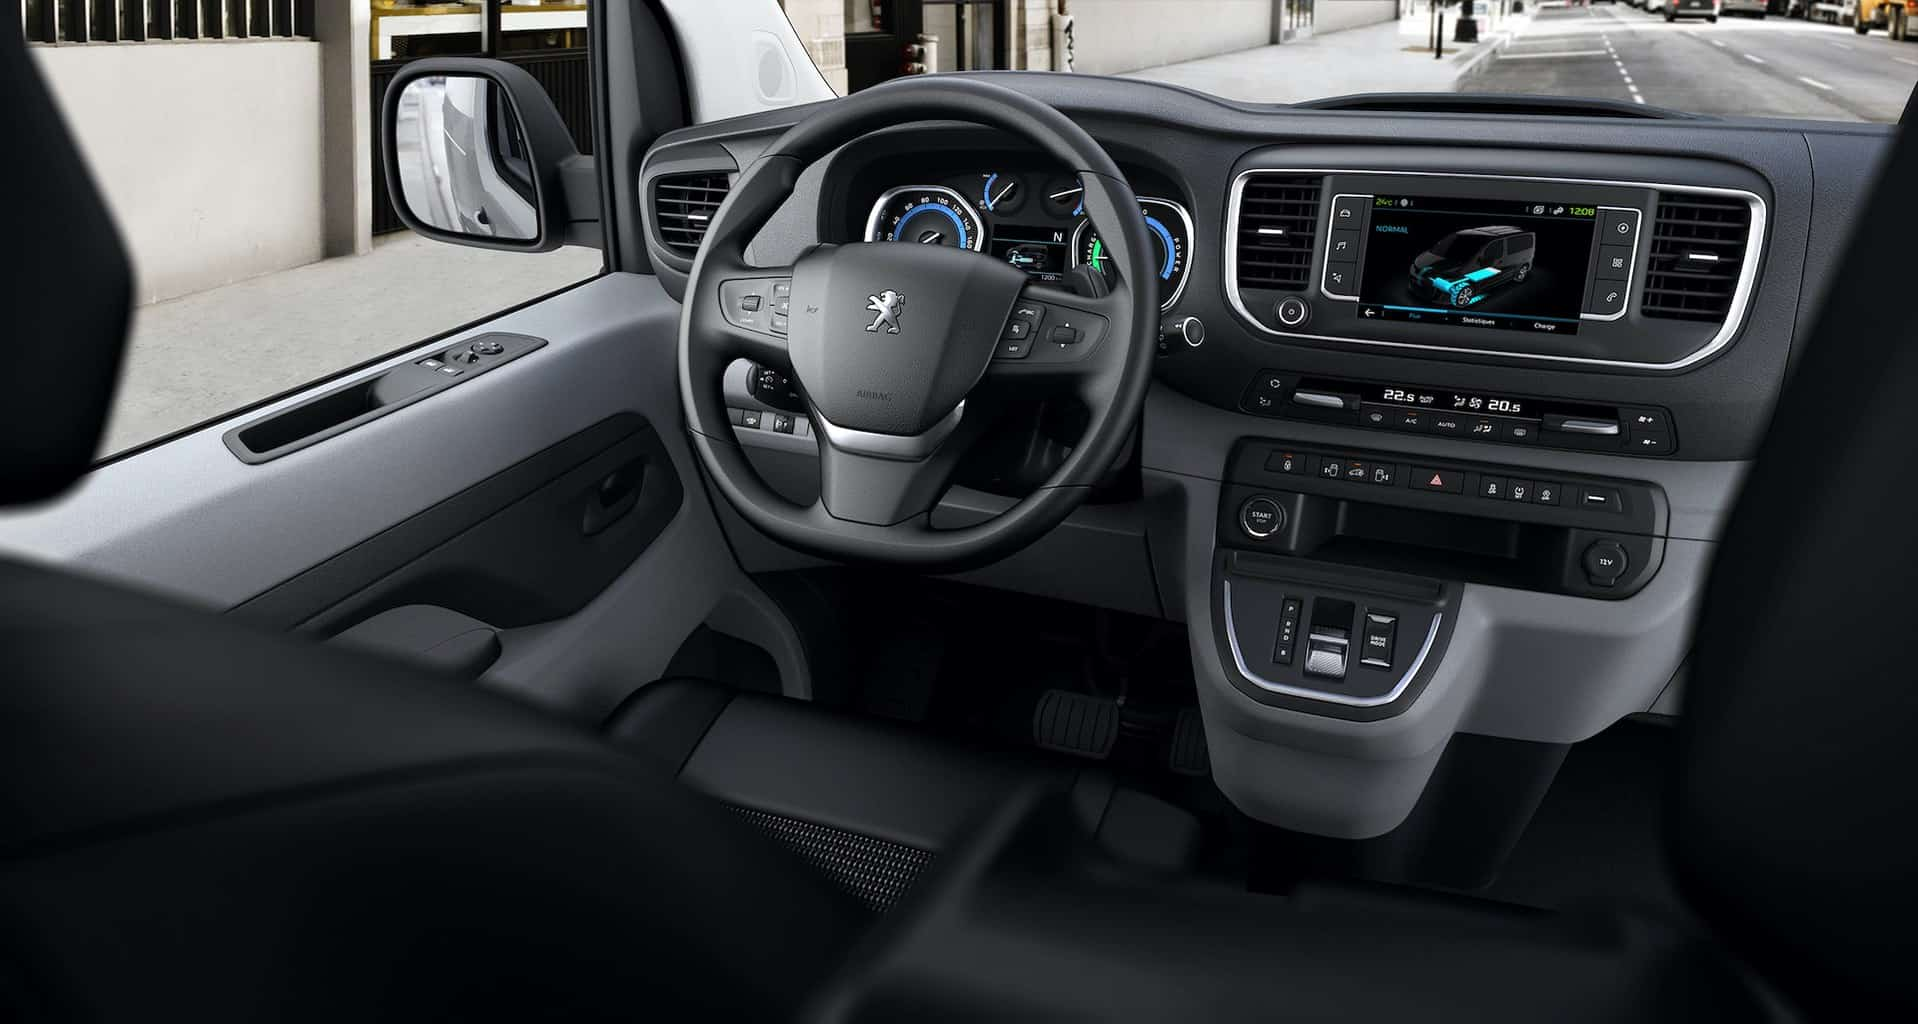 Peugeot Elektro Transporter e-Expert Cockpit